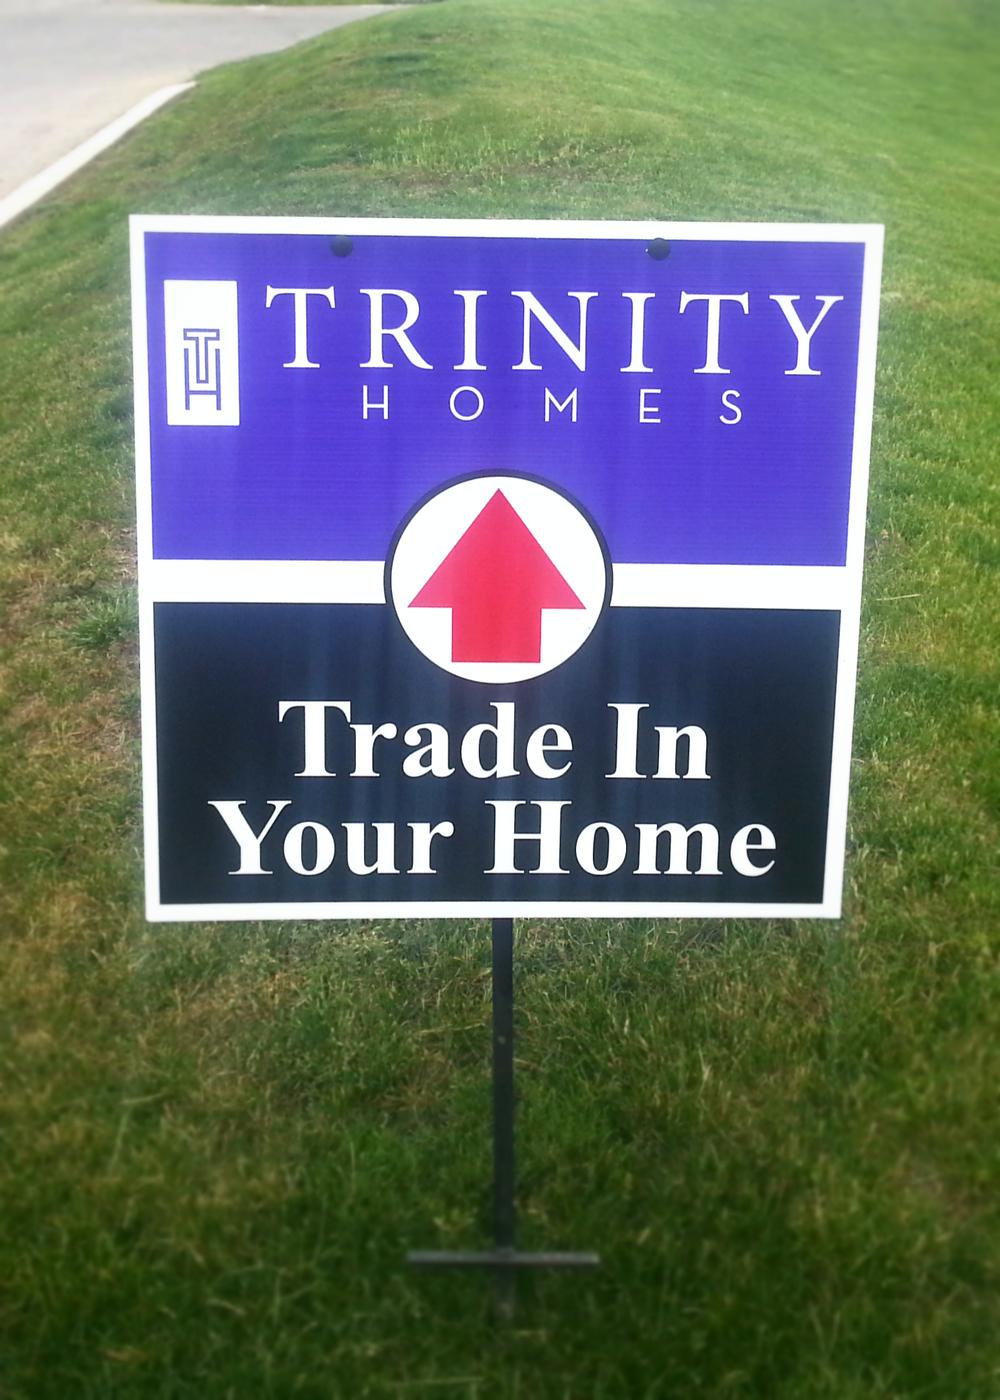 2015.05.21 Trinity Homes Directional.jpg